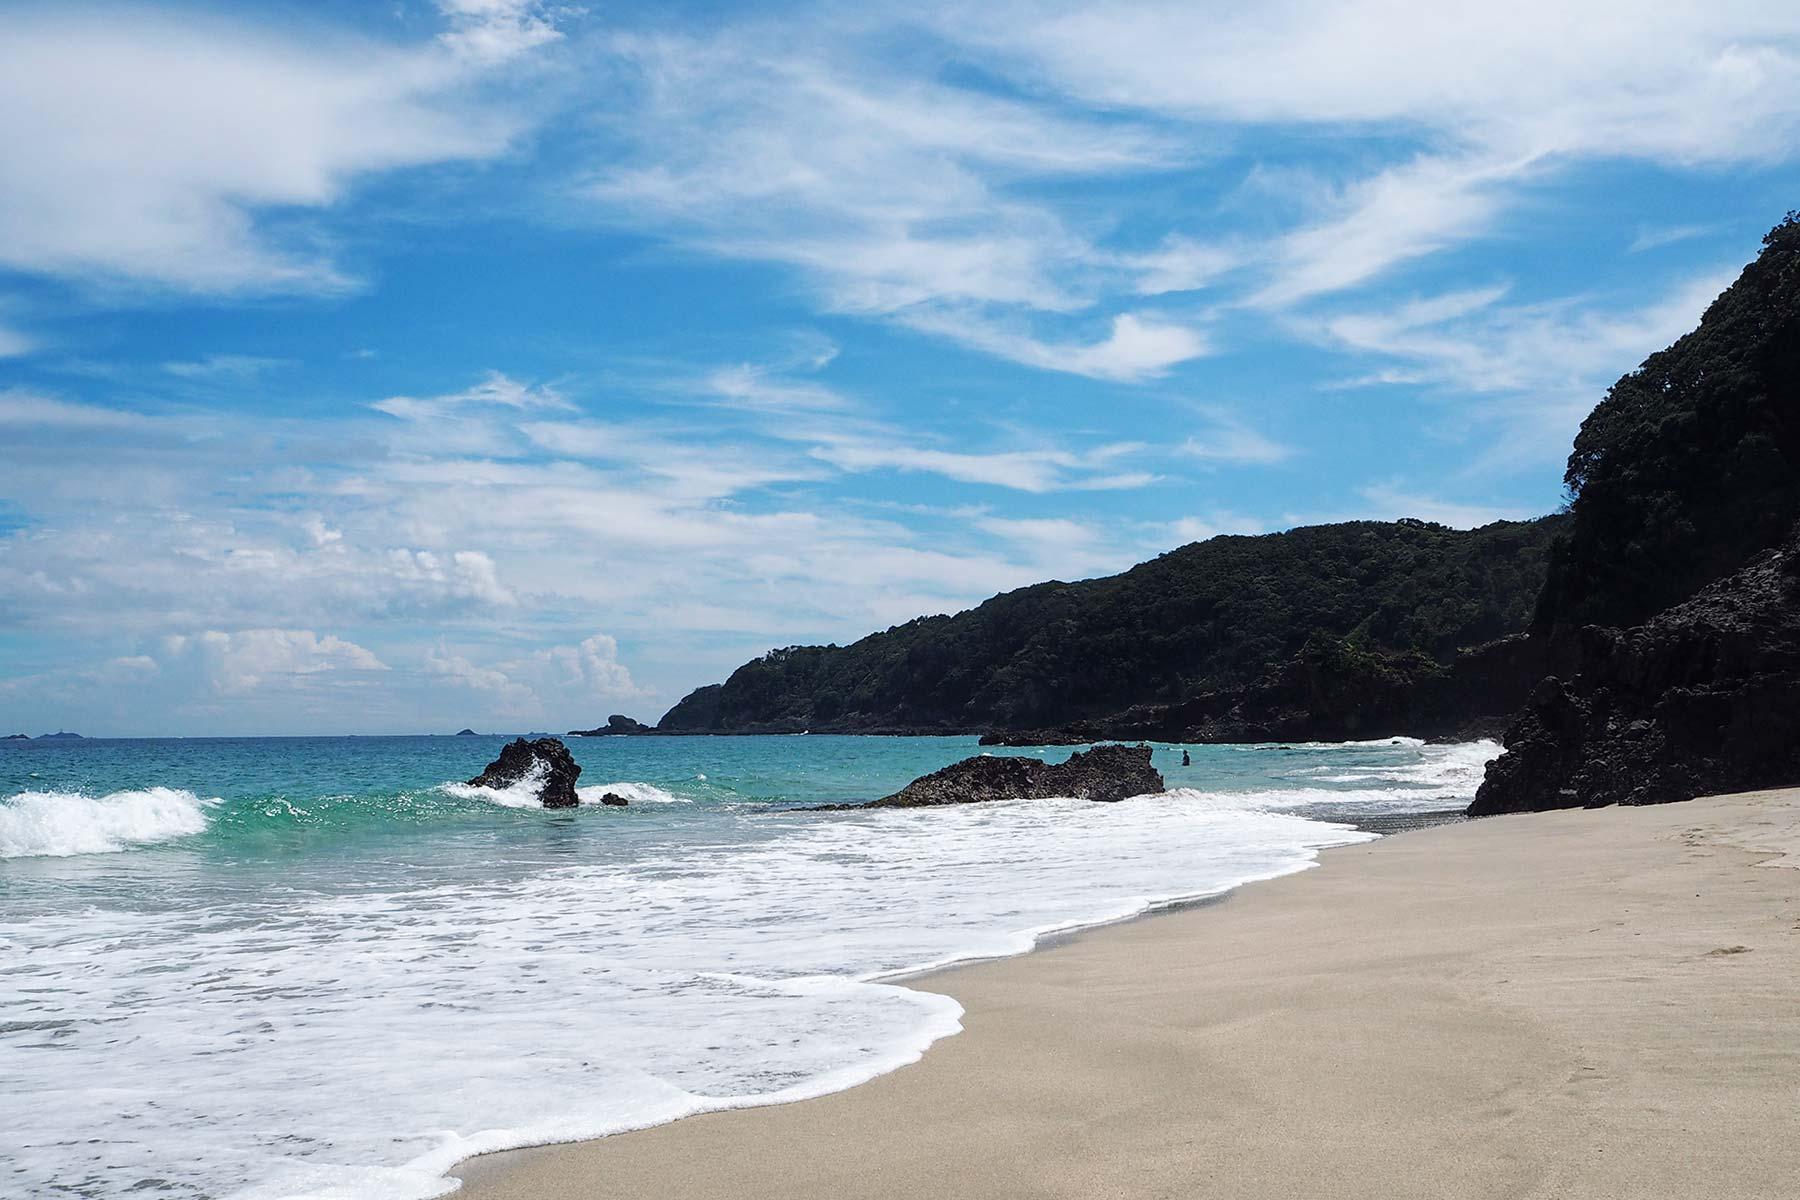 Strandurlaub In Japan Travelisto Familien Reiseblog